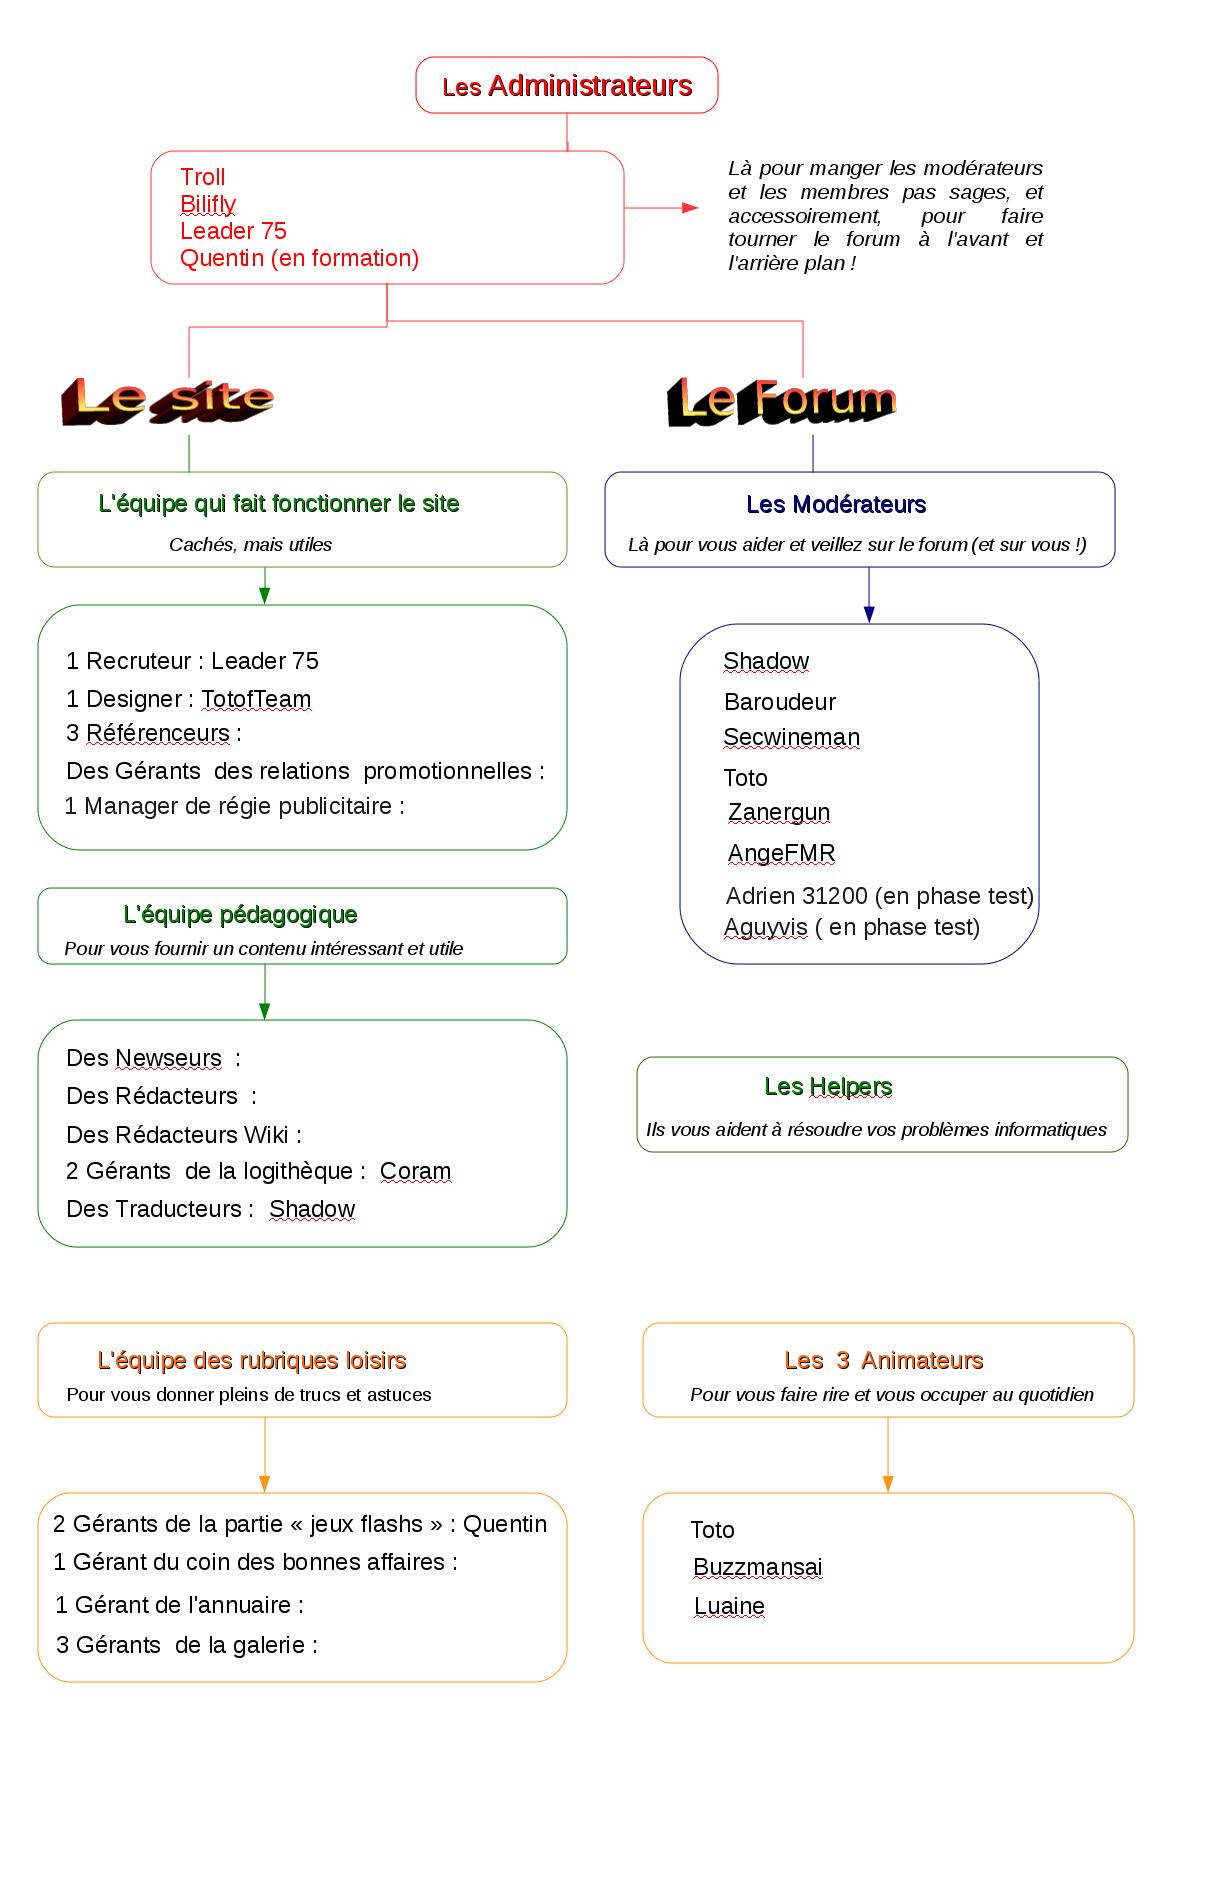 Image: organigramme_de_l_equipe234.png